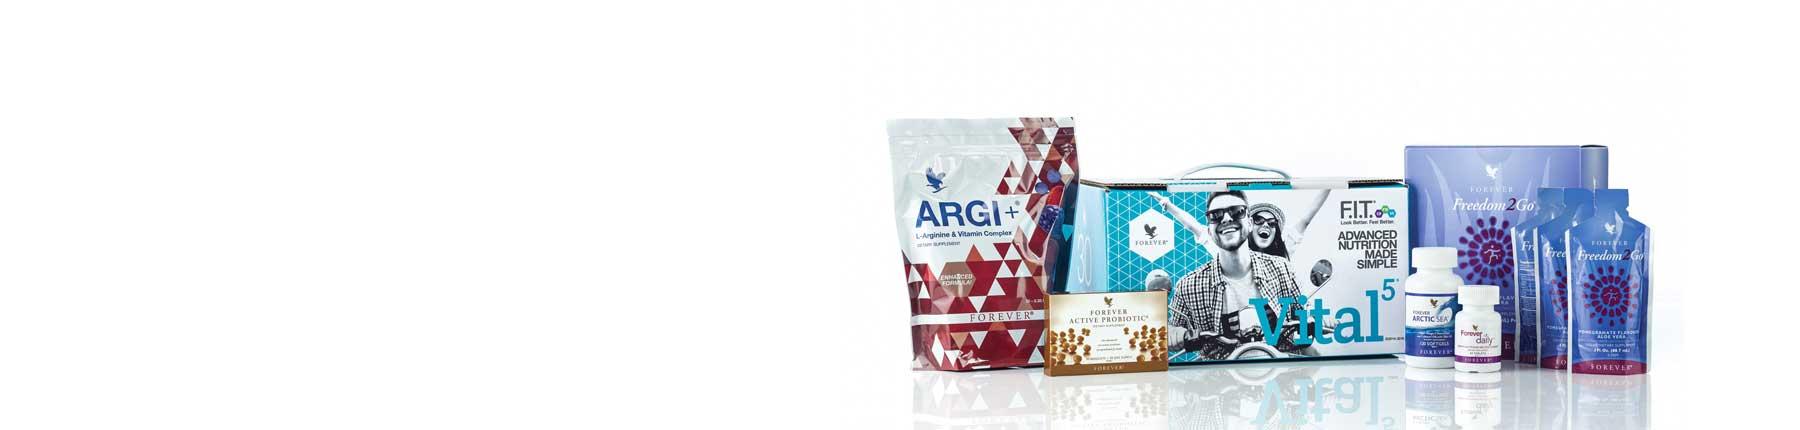 Forever Living Aloe Vera proizvodi FIT proizvodi za regulaciju telesne tezine